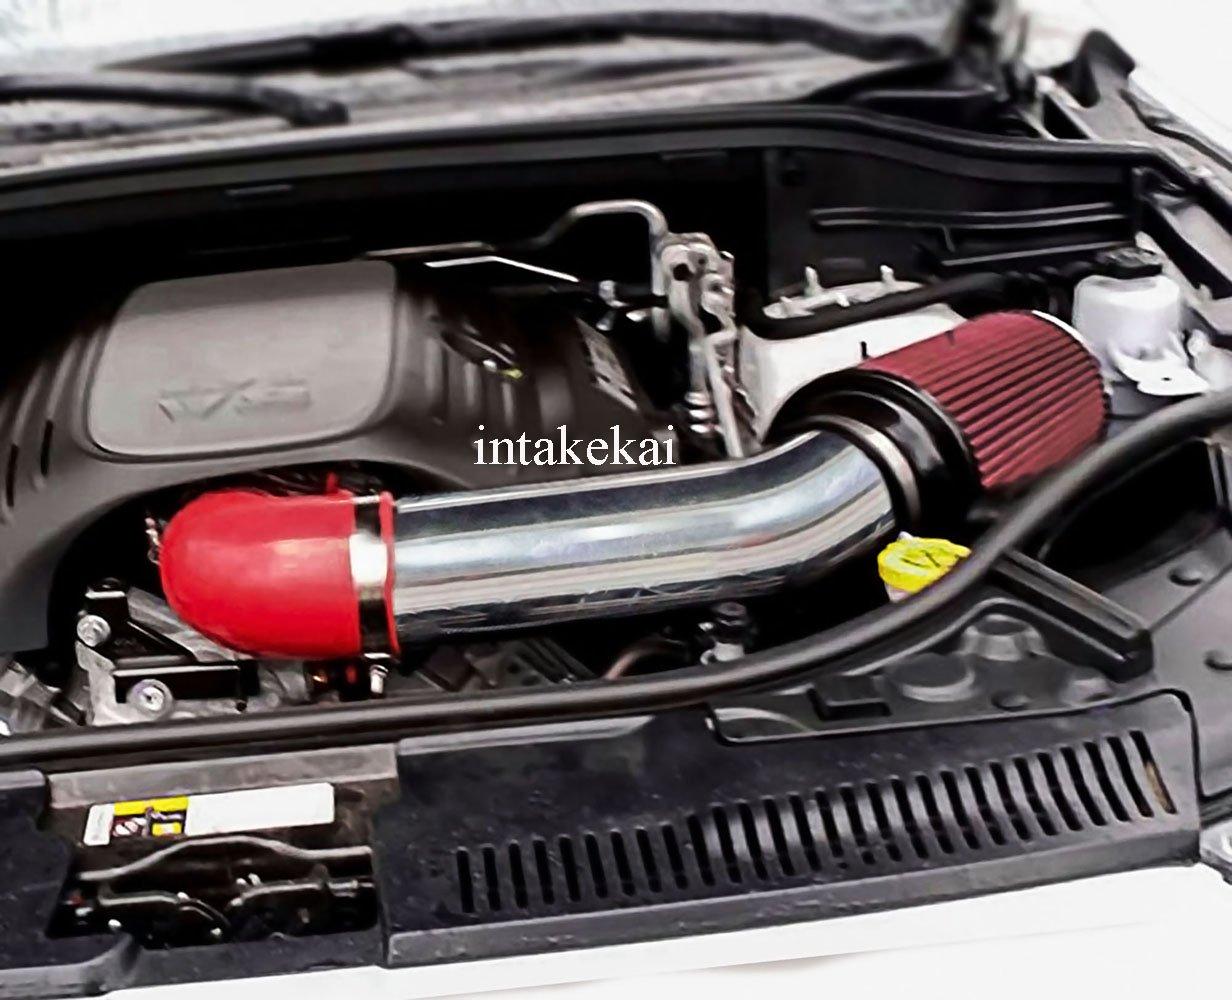 Performance Air Intake for 2011 2012 2013 2014 2015 DODGE DURANGO//JEEP GRAND CHEROKEE 5.7L V8 HEMI ENGINE BLACK